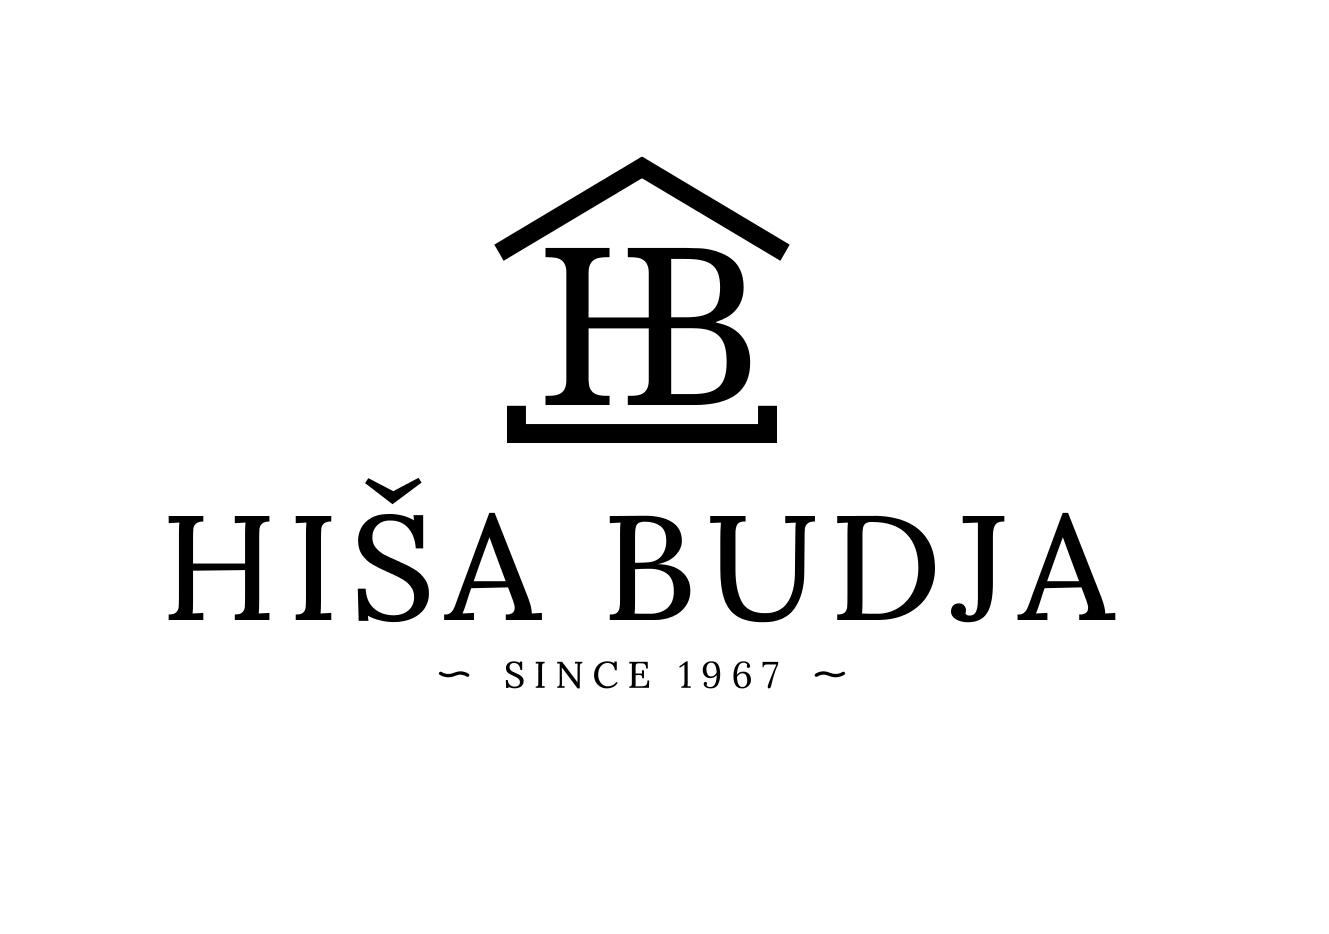 Hiša Budja